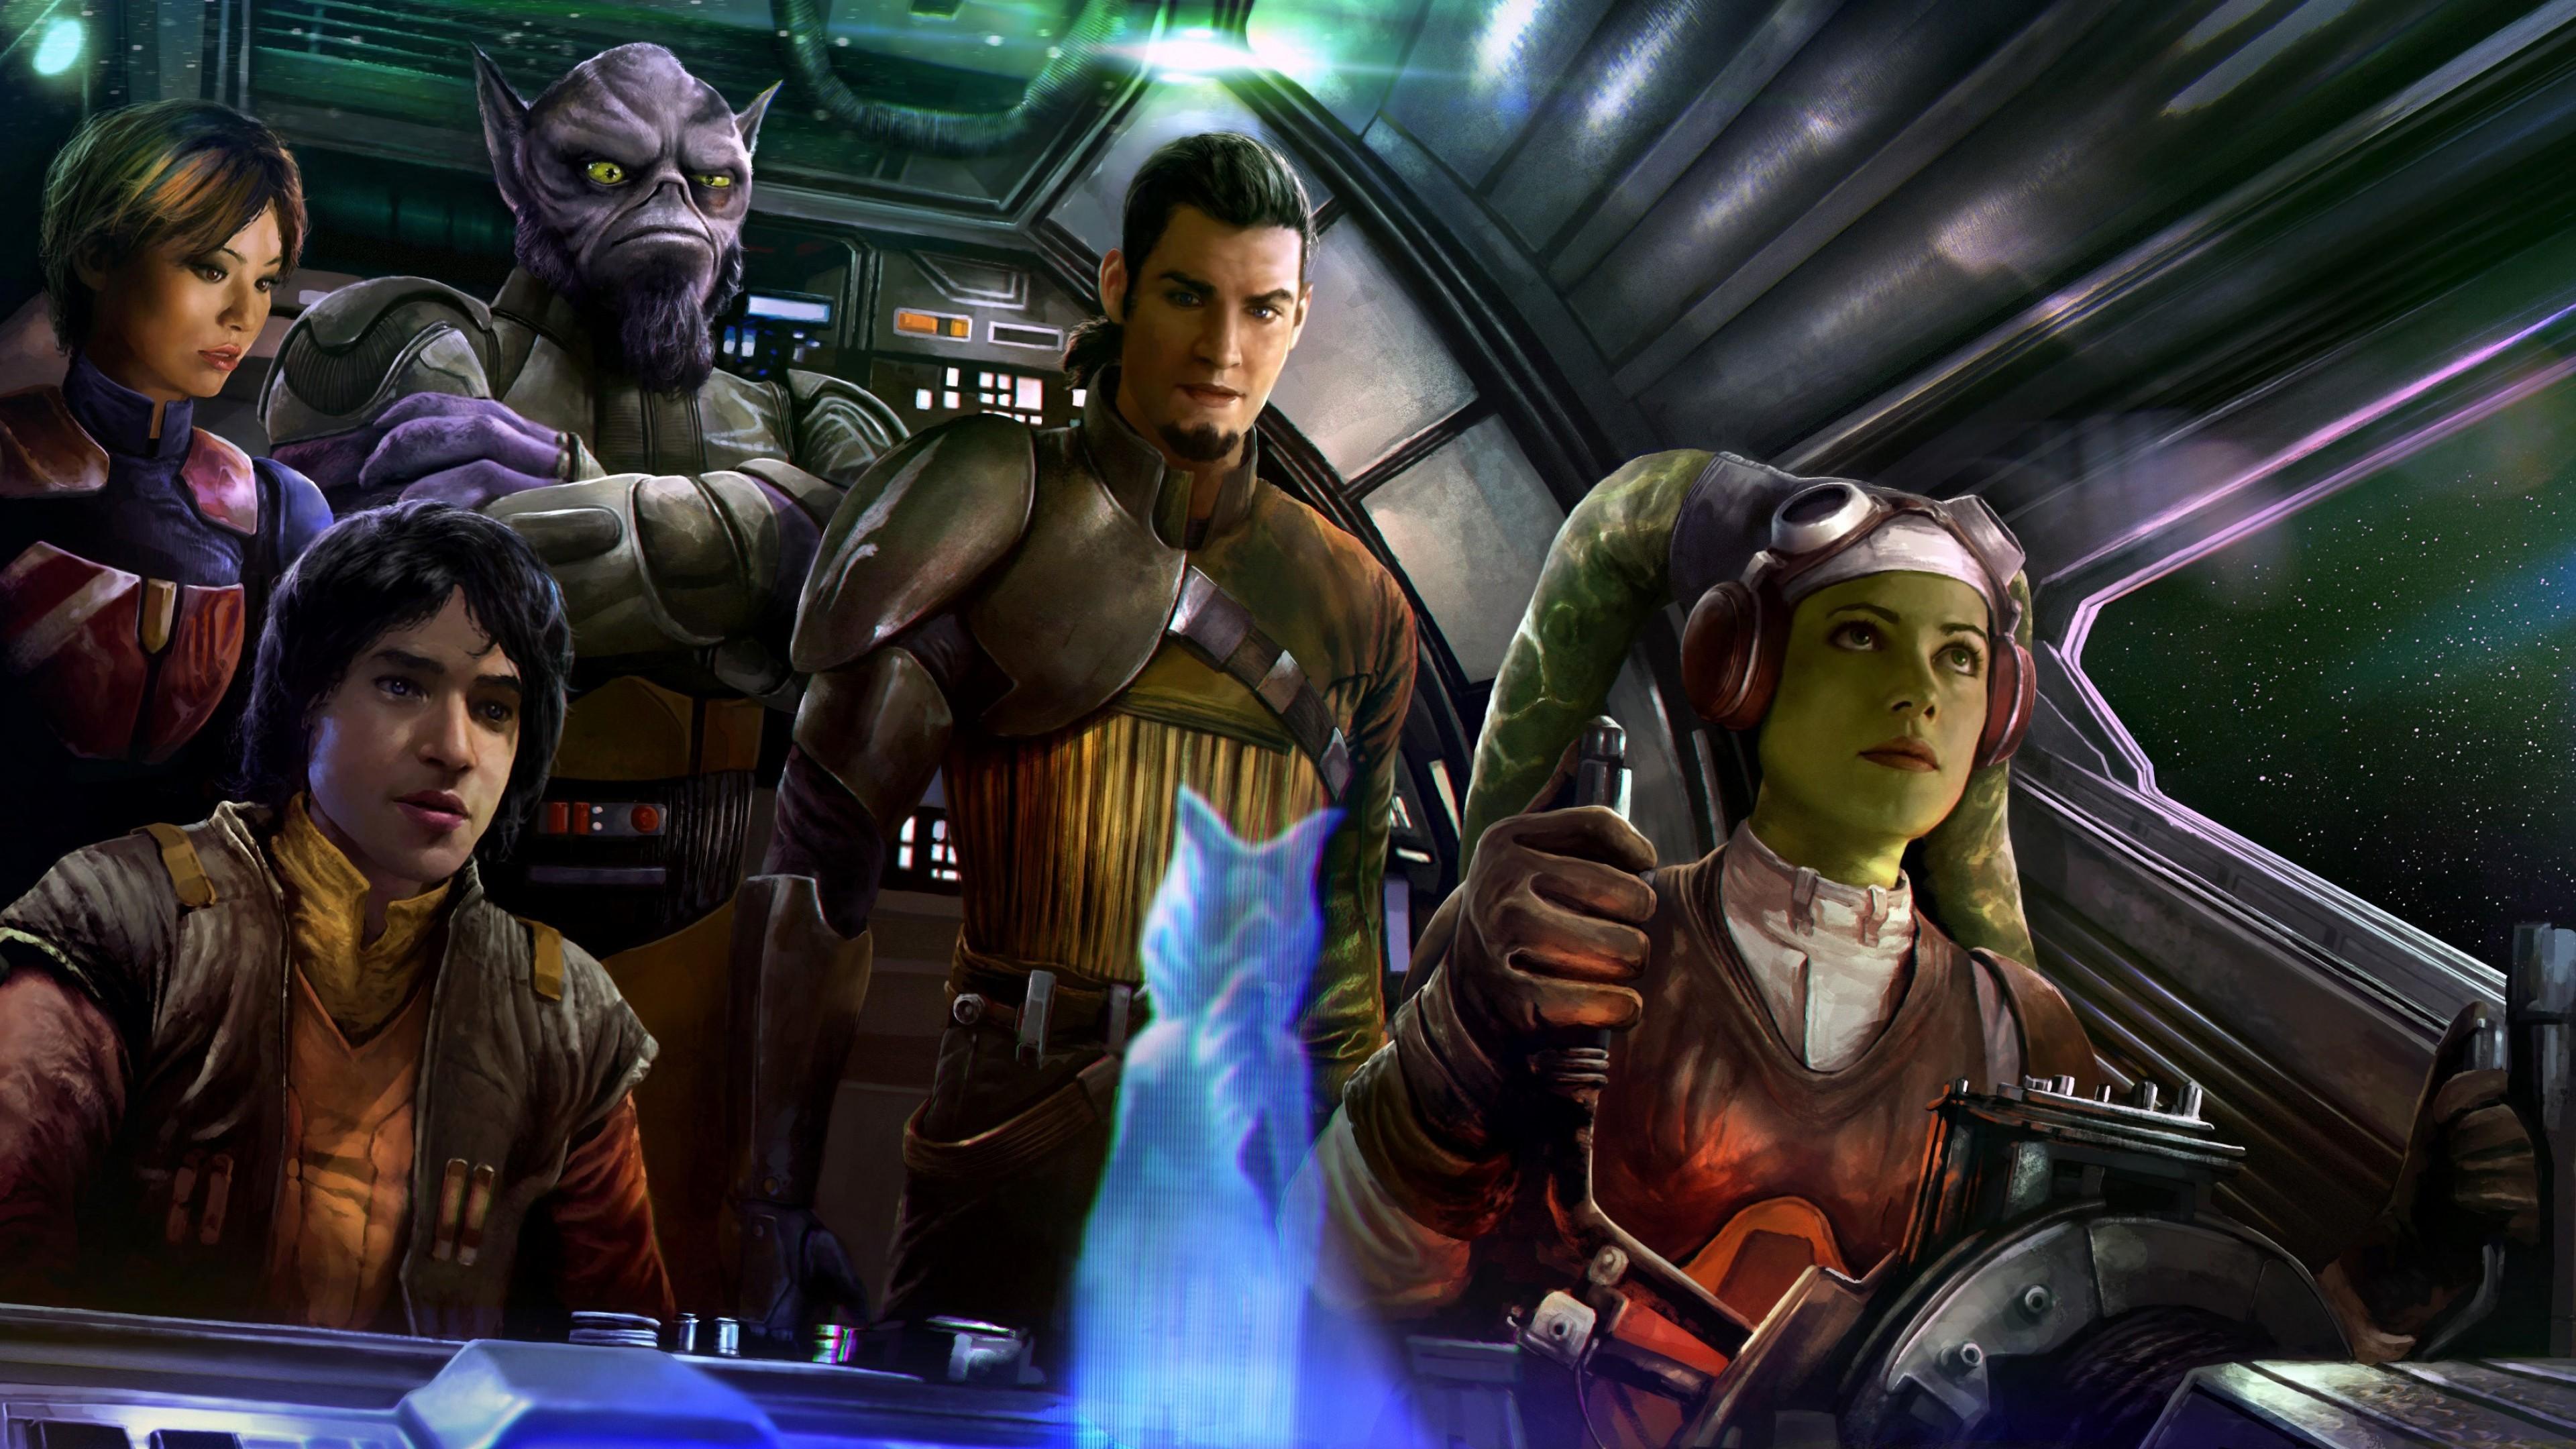 Wallpaper Star Wars Rebels Season 4 Movies 13438